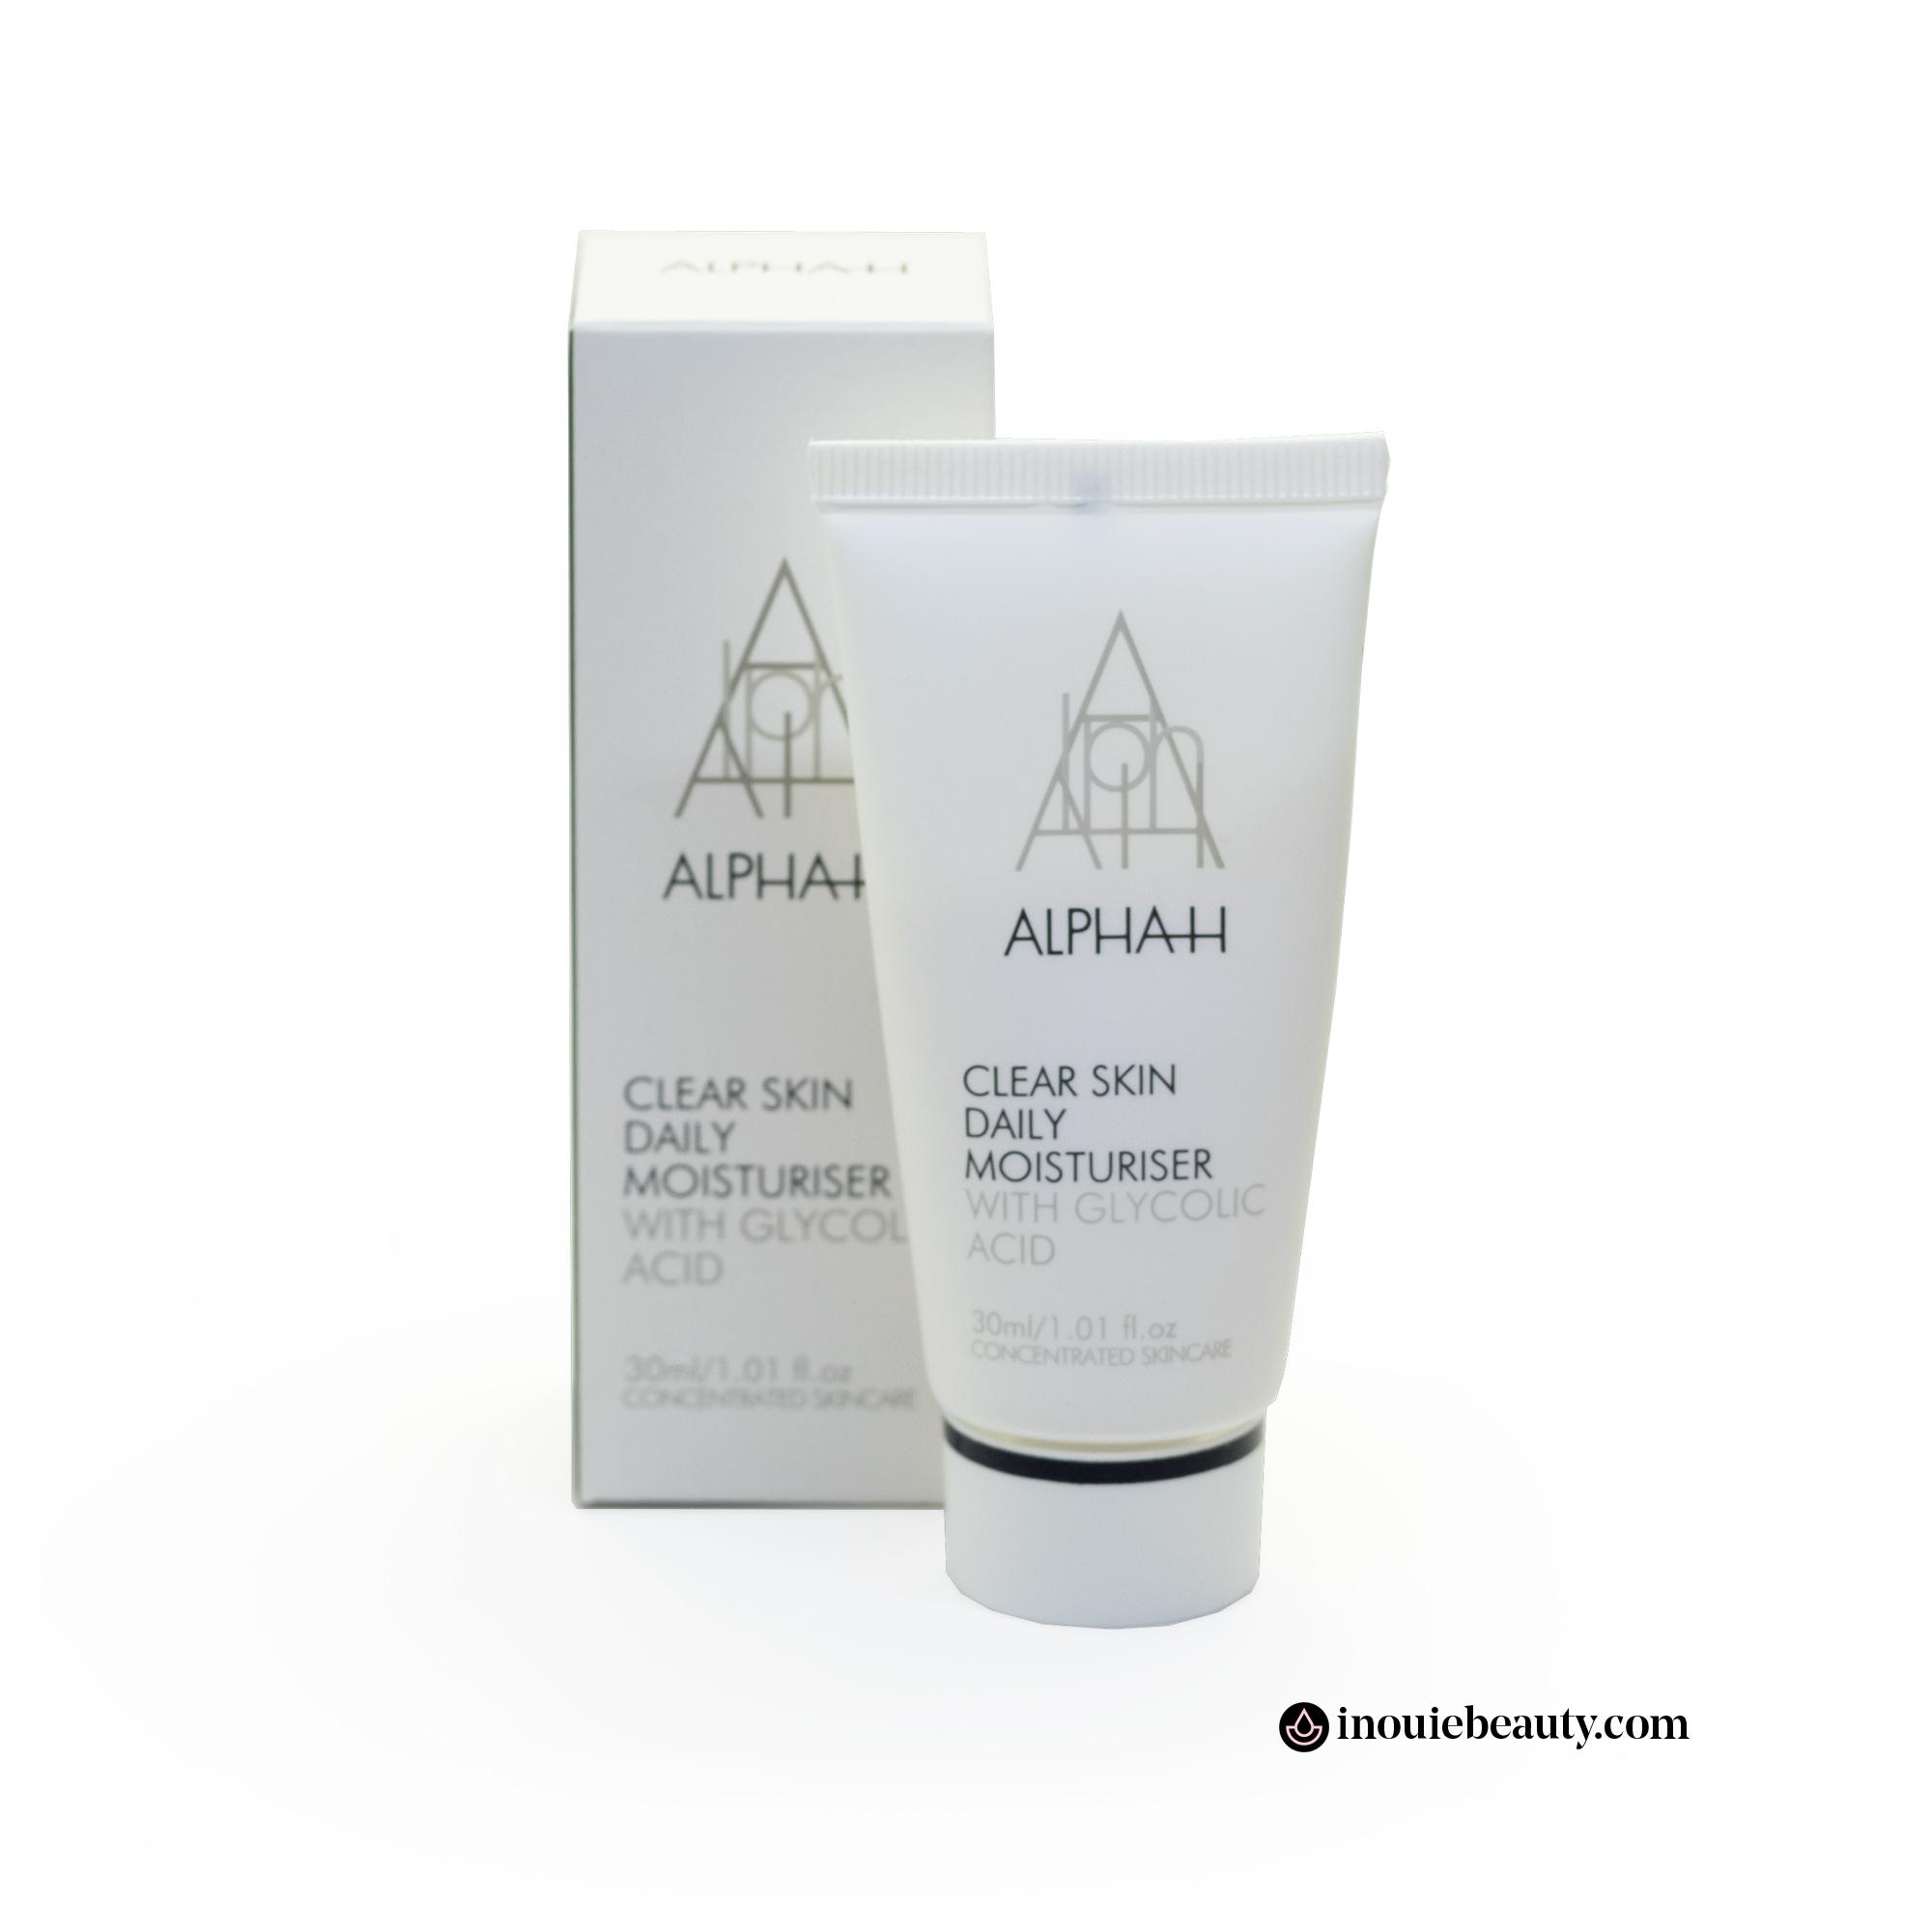 Alpha-H Clear Skin Daily Moisturiser